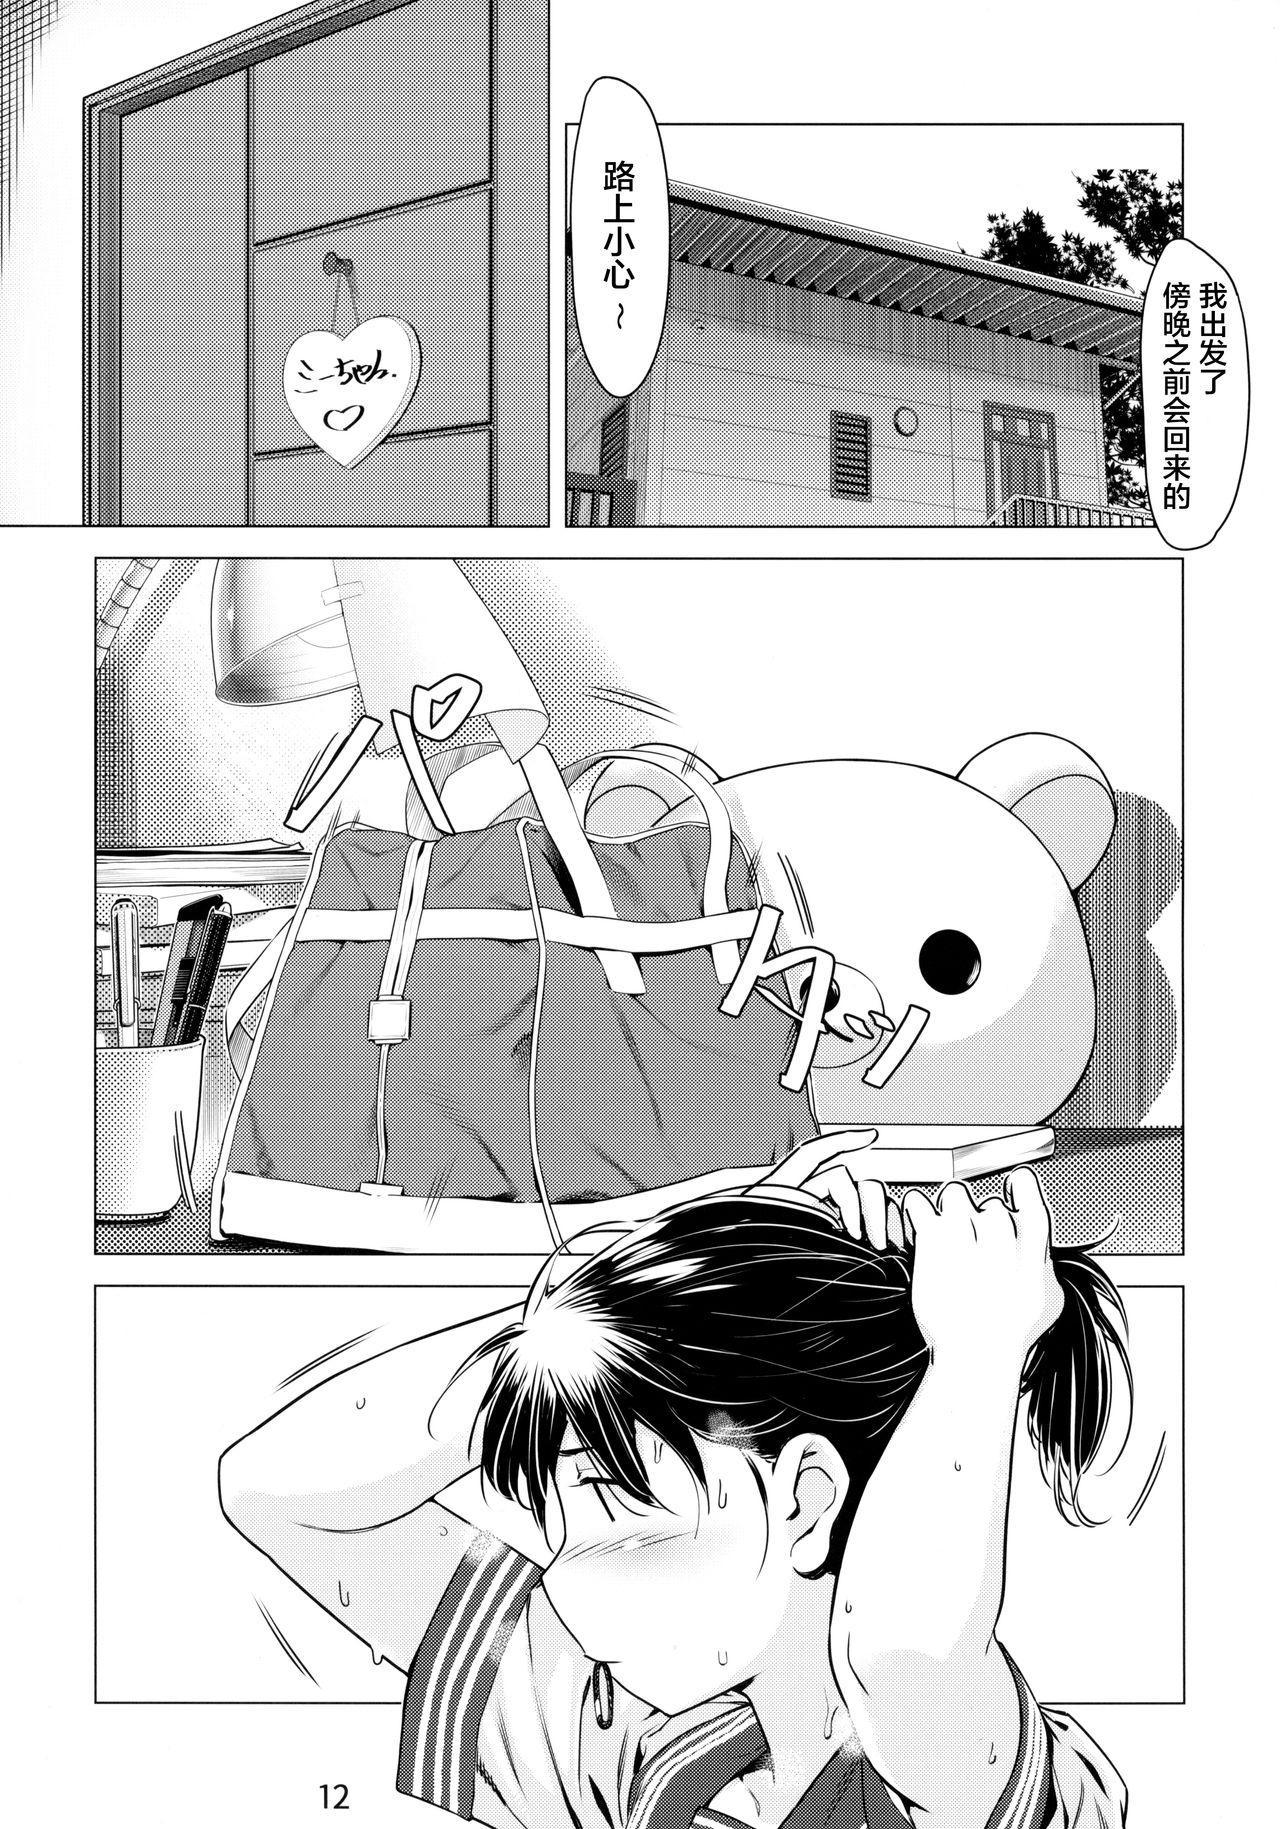 Otonano Omochiya 6 Kan 11